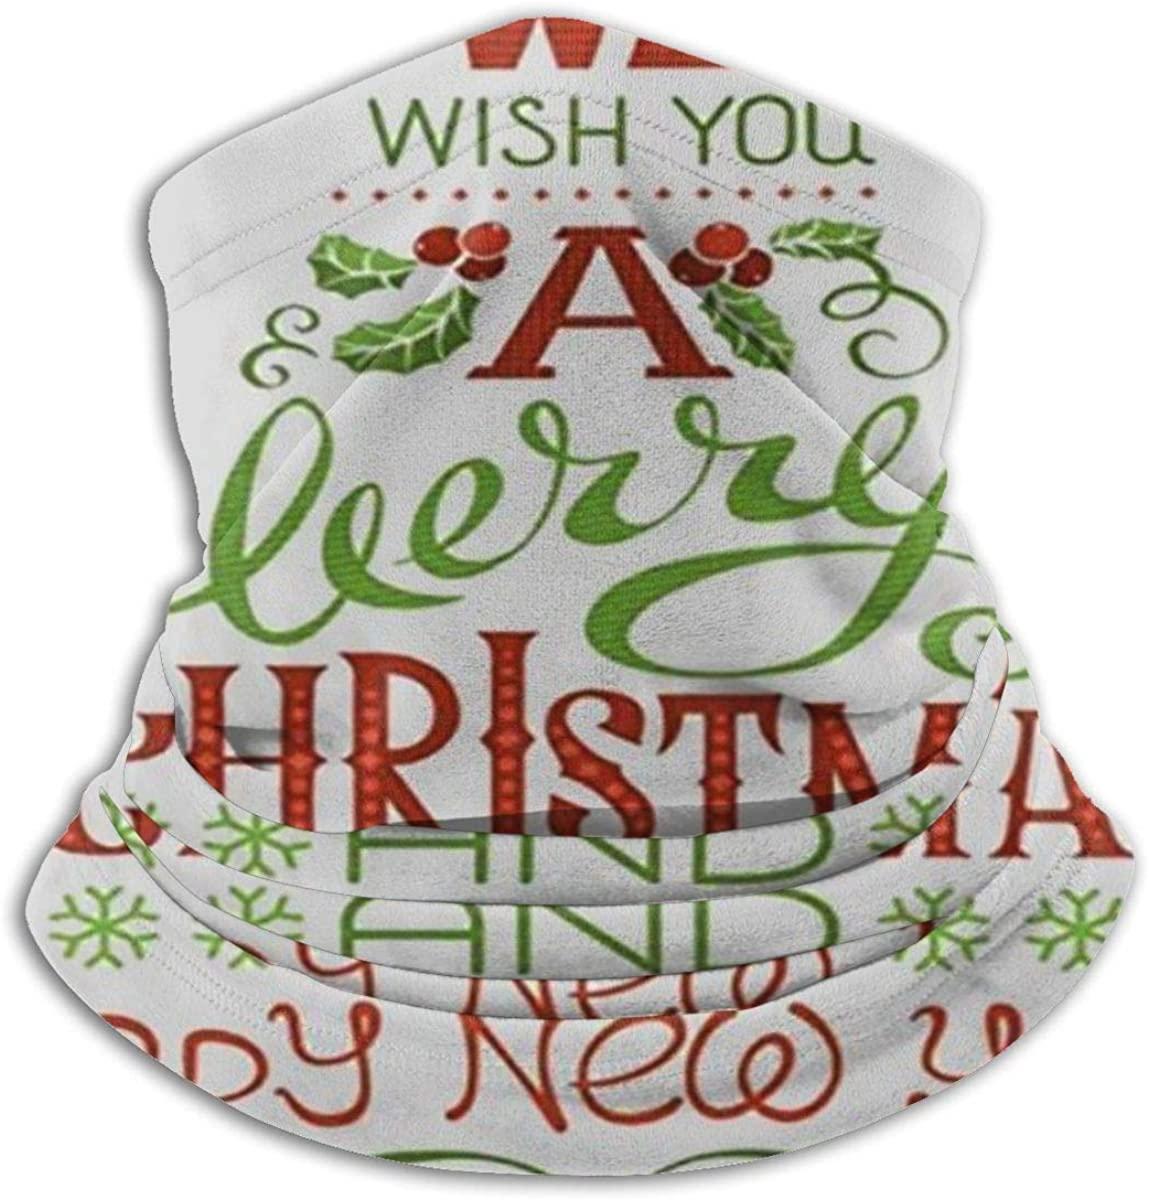 Face Mask, Neck Gaiter, Merry Christmas Tree Happy New Year Bandana, Balaclava Windproof Anti Dust Magic Scarf for Women Men